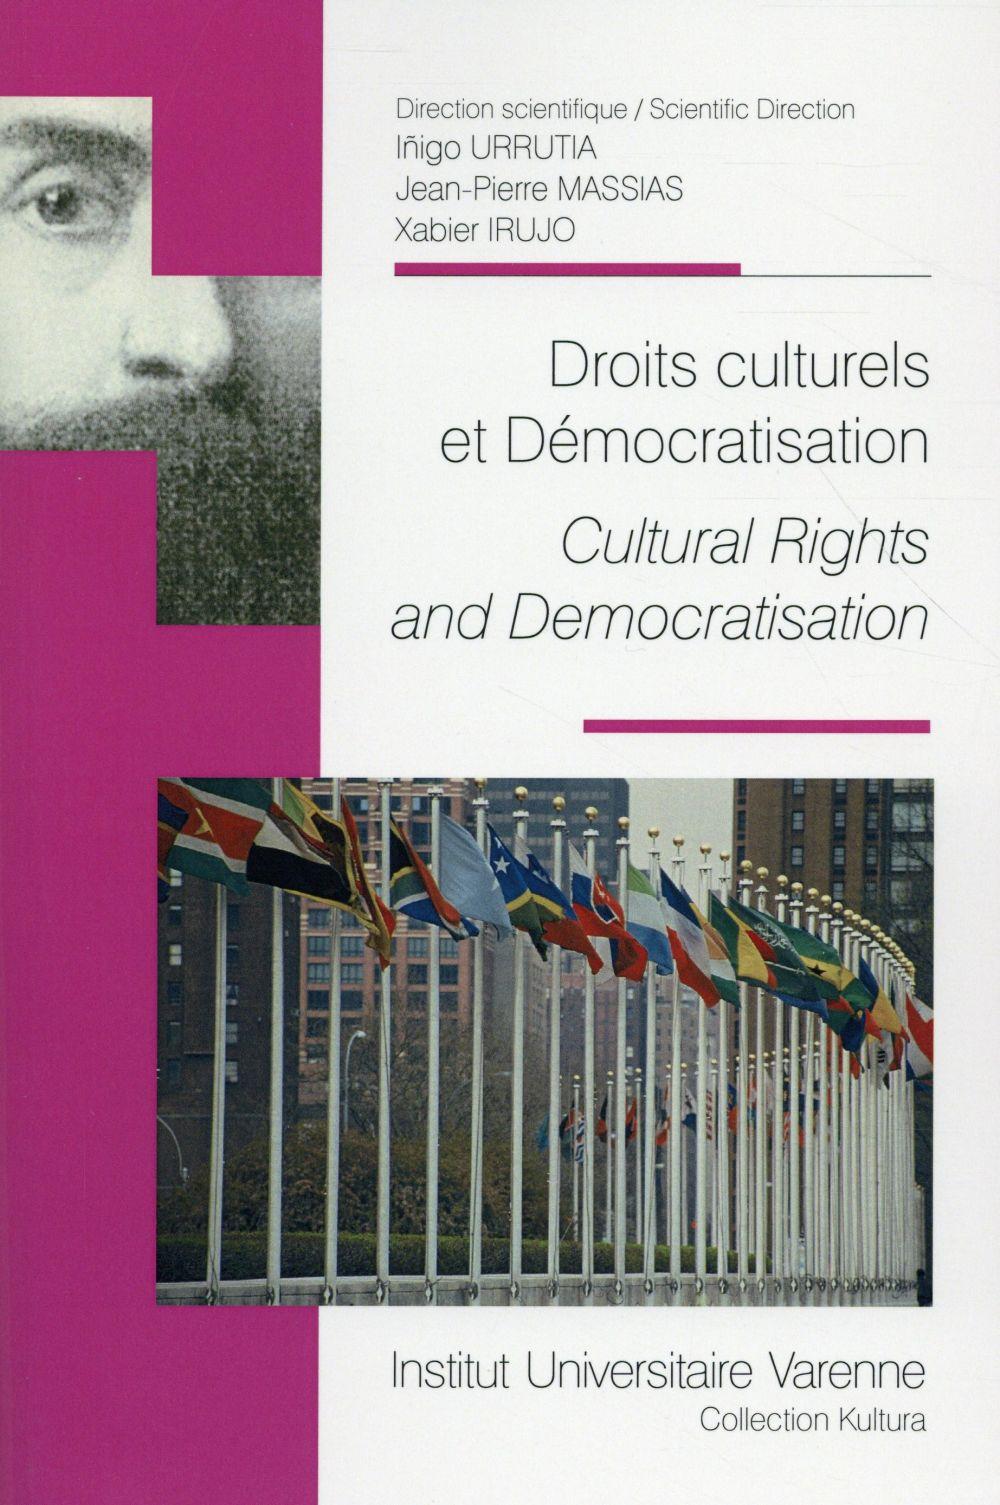 Droits culturels et démocratisation ; cultural rights and democratisation